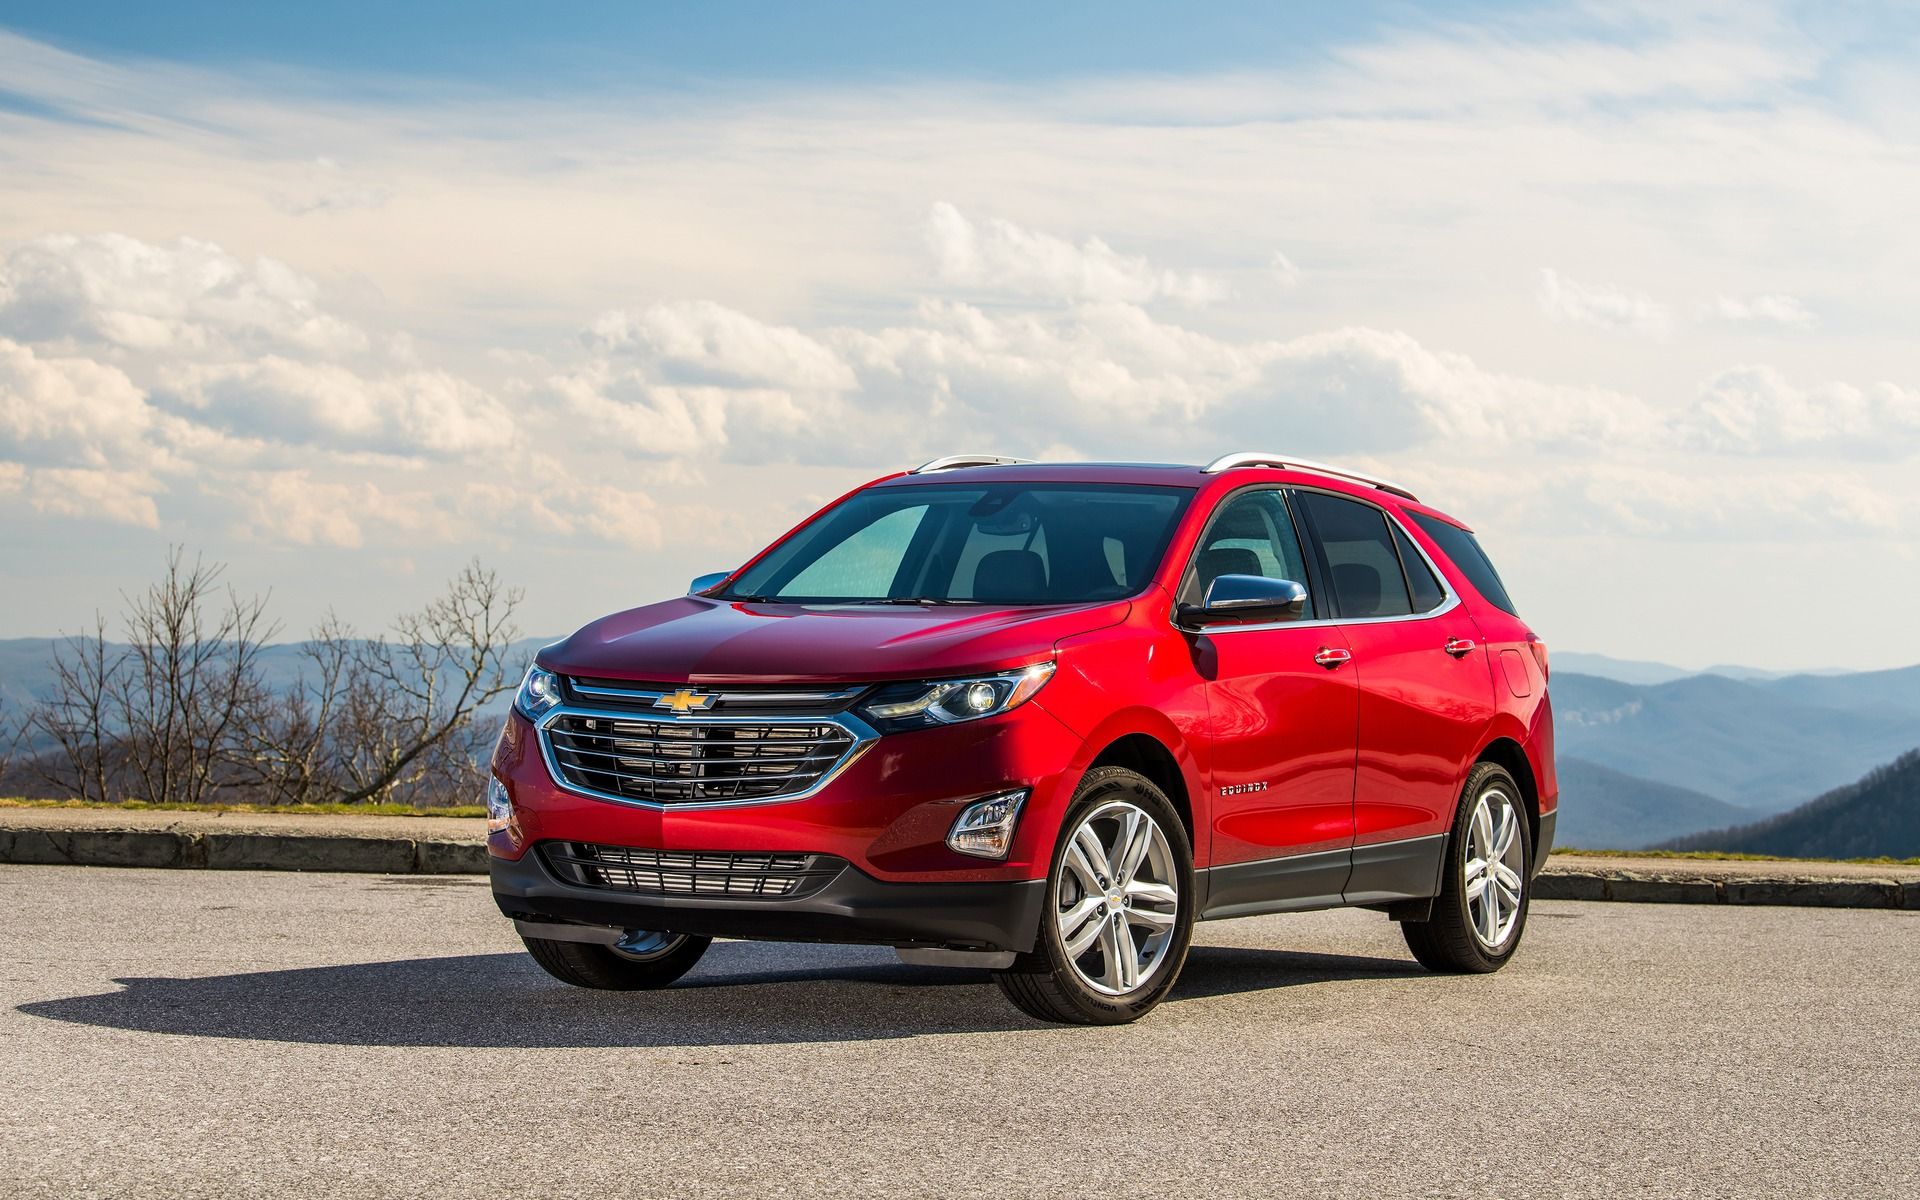 Used Chevy Equinox >> 2018 Chevrolet Equinox photos - 1/3 - The Car Guide